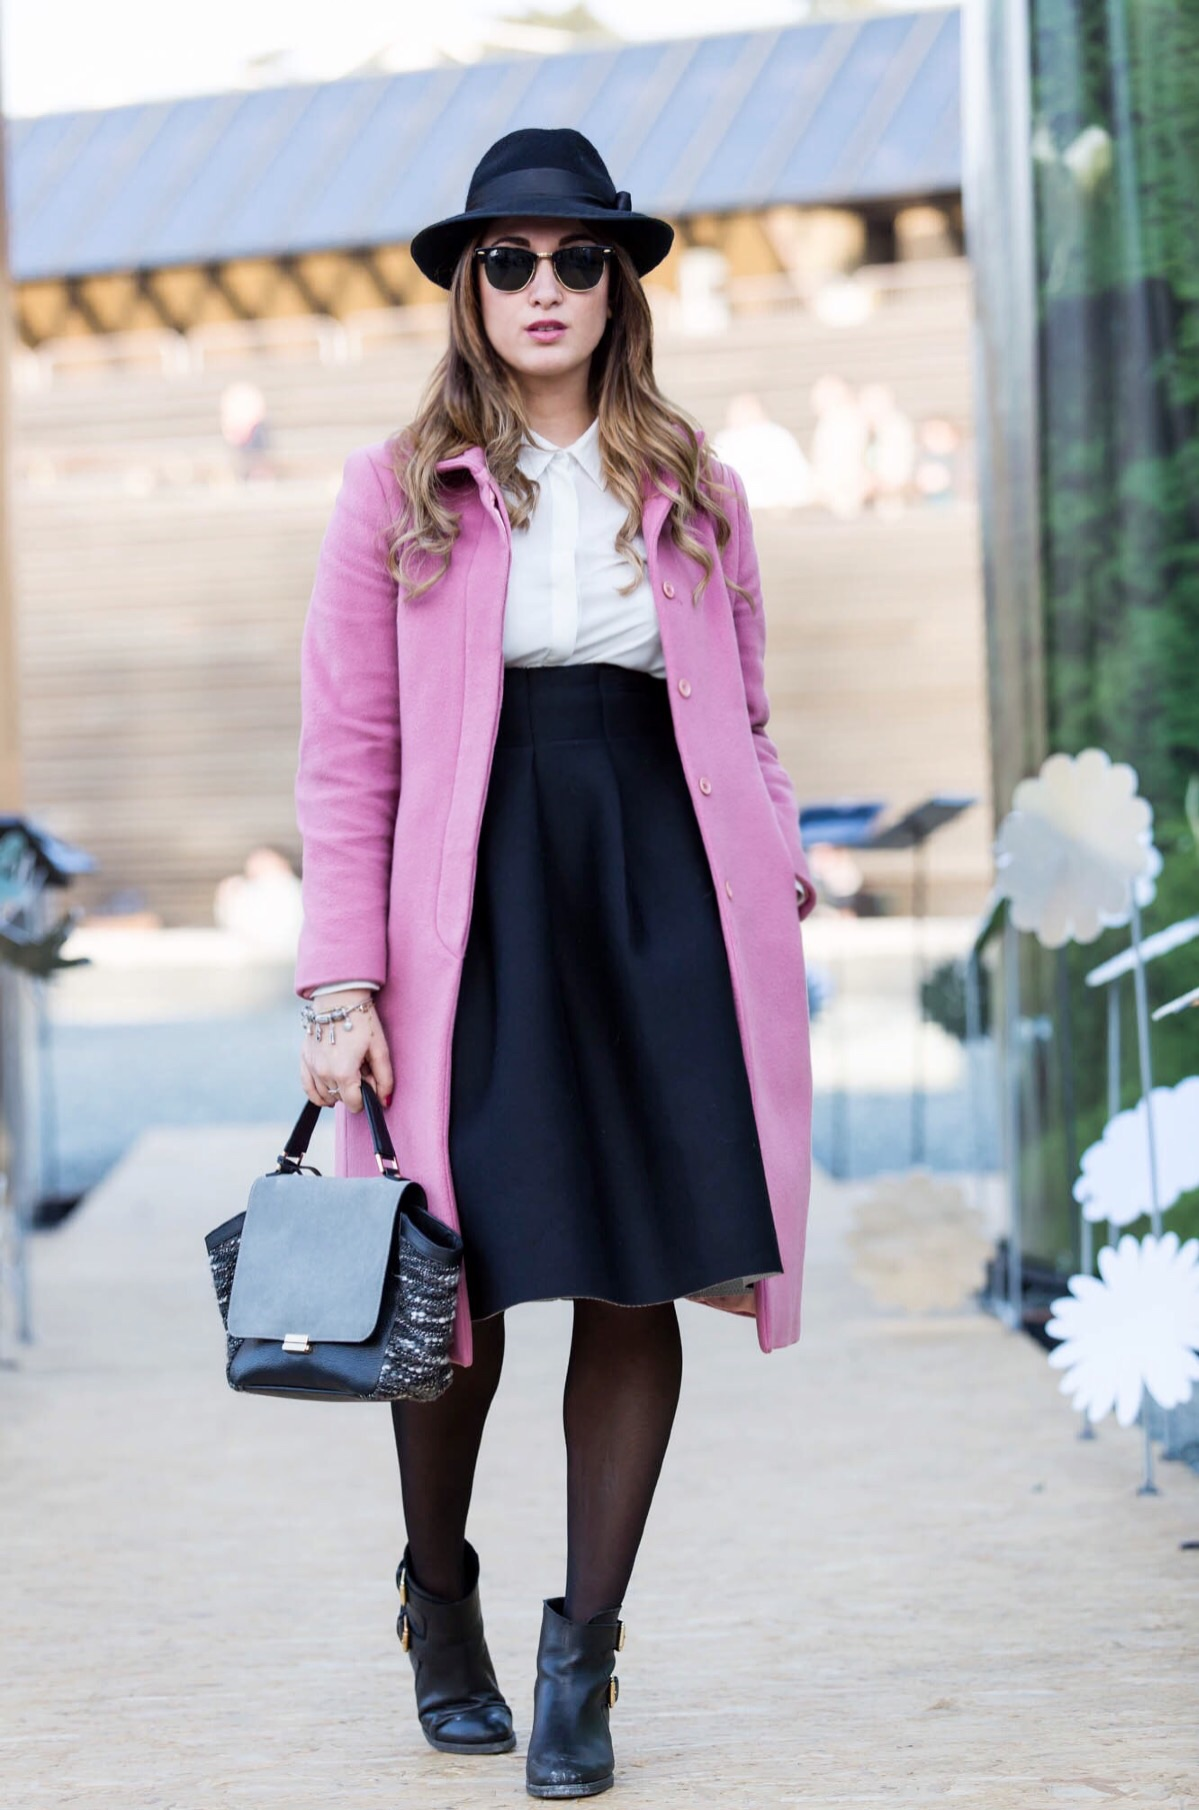 my glamour attitude, fashion blog, maria giovanna abagnale, manuel bifari ph, pitti87, look, pink coat, gioseppo shoes, jadise bag, neoprene skirt, rayban, firenze, florence, walk about pitti